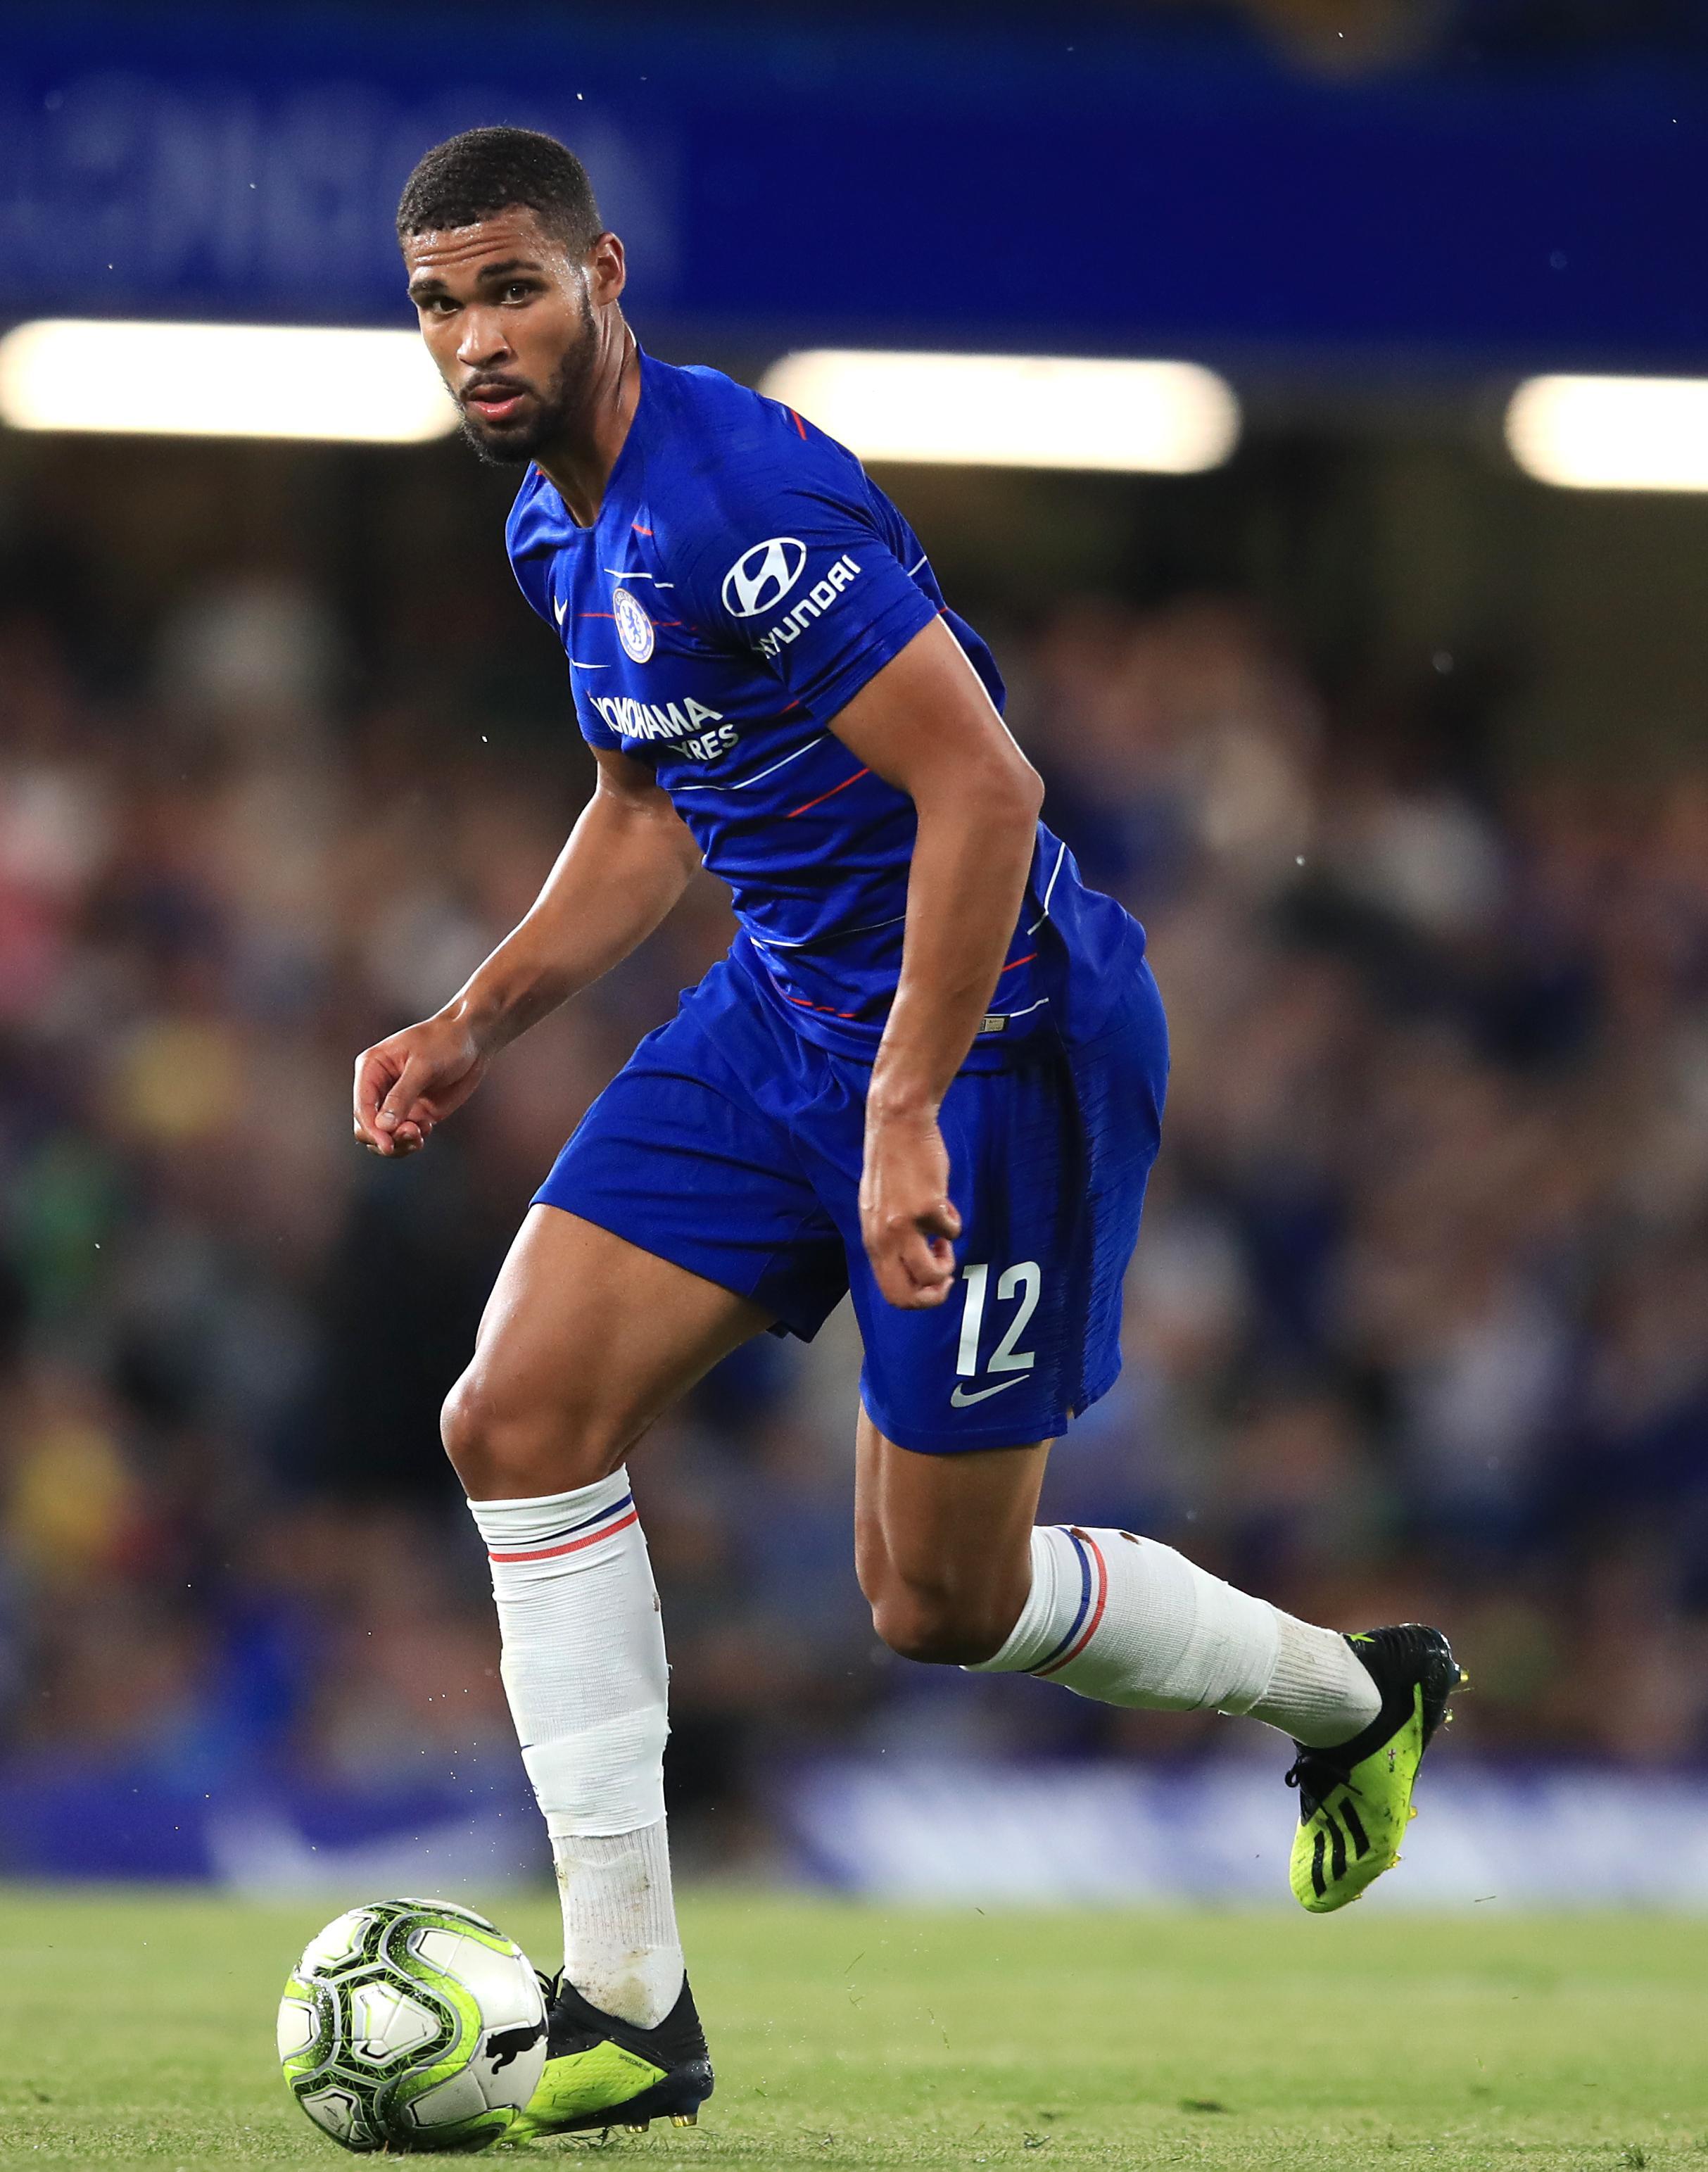 Ruben Loftus-Cheek will get game time at Chelsea, says Maurizio Sarri